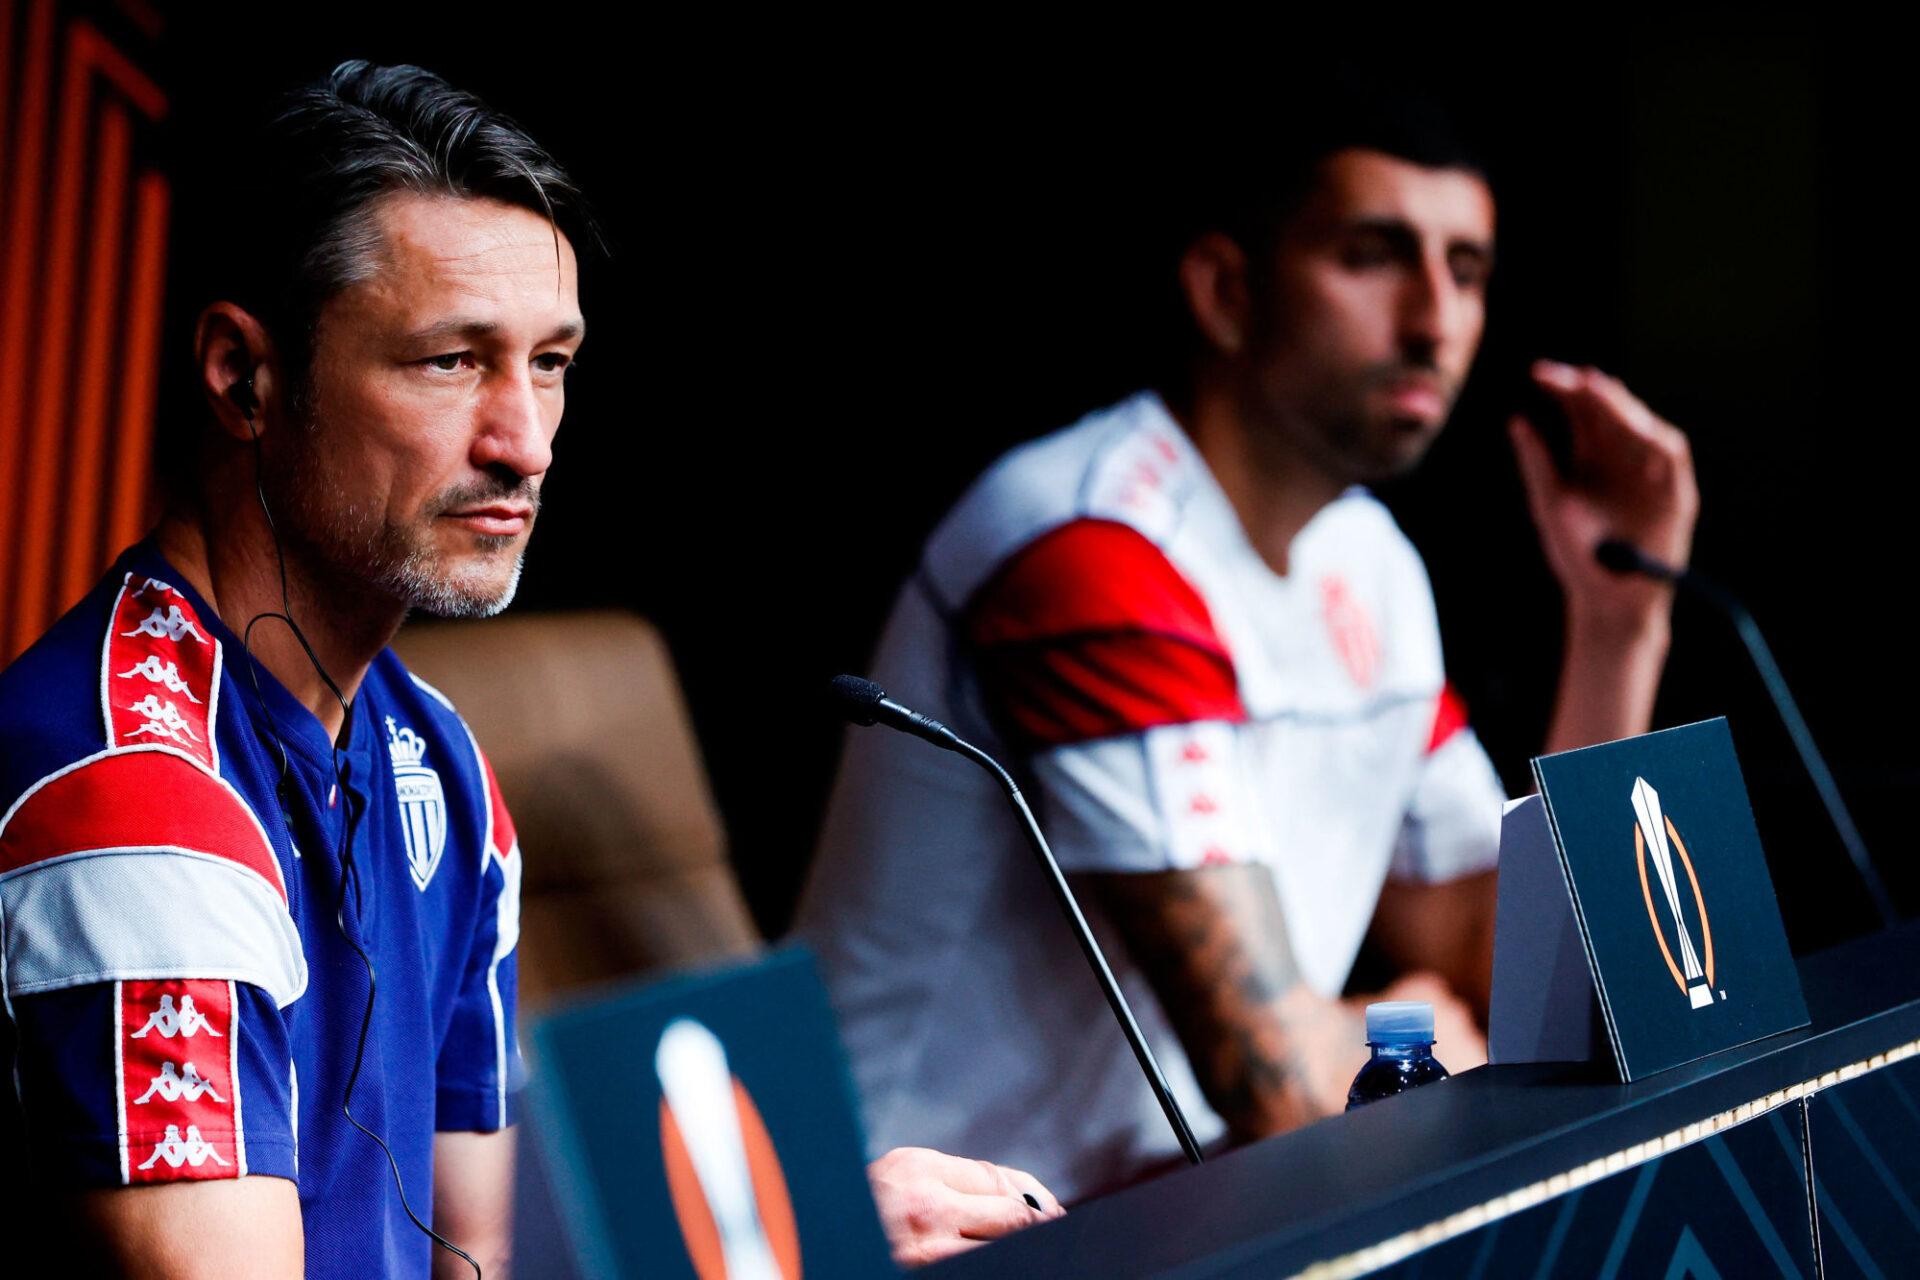 Niko Kovac était en conférence de presse avec son défenseur Guillermo Maripan. Icon Sport